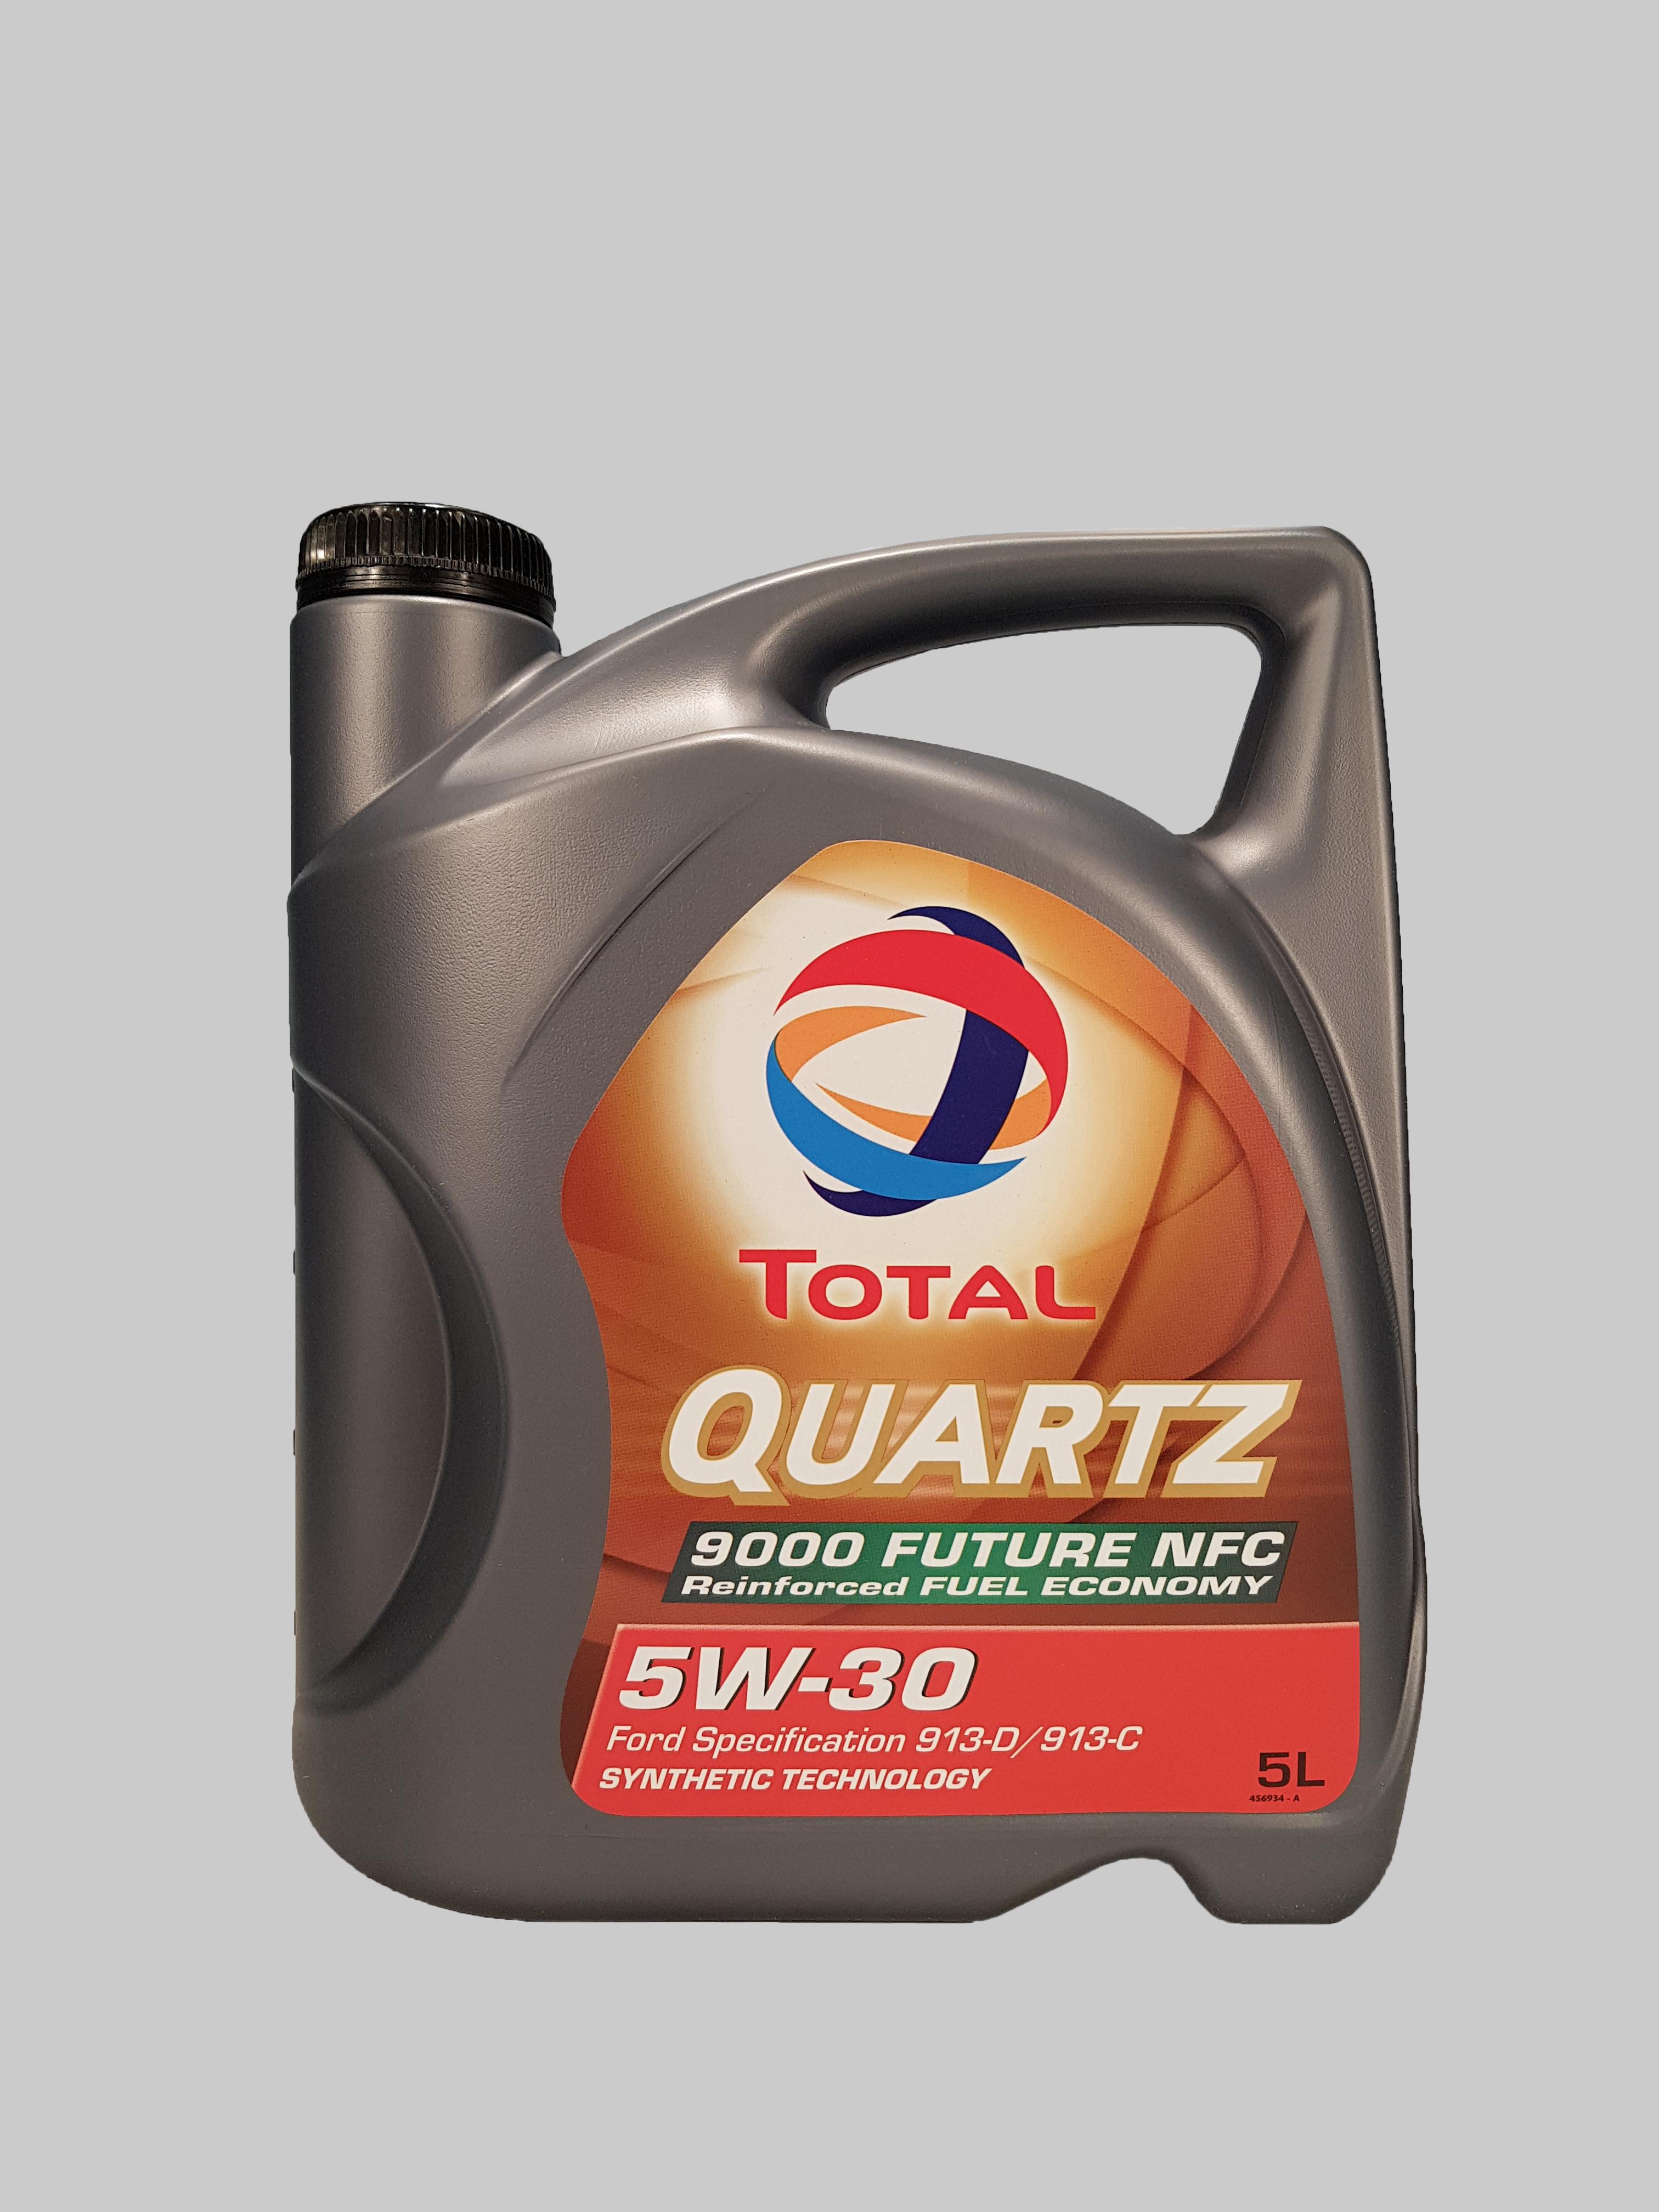 Total Quartz 9000 Future NFC 5W-30 5 Liter